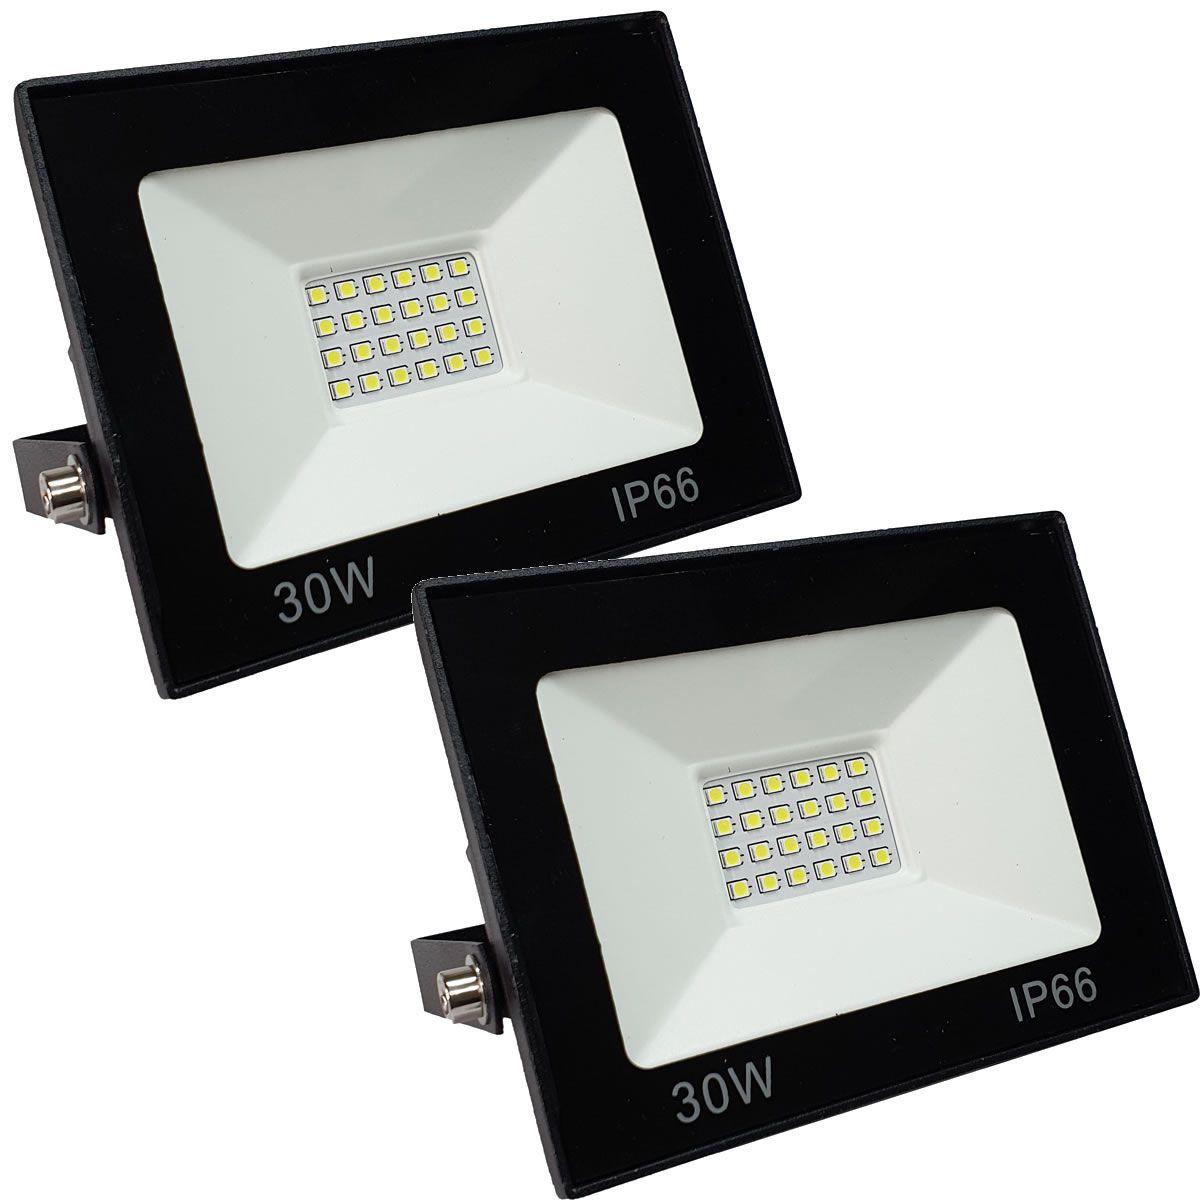 KIT 2 refletor 30w LED SMD Holofote Bivolt Externo Luz Branca